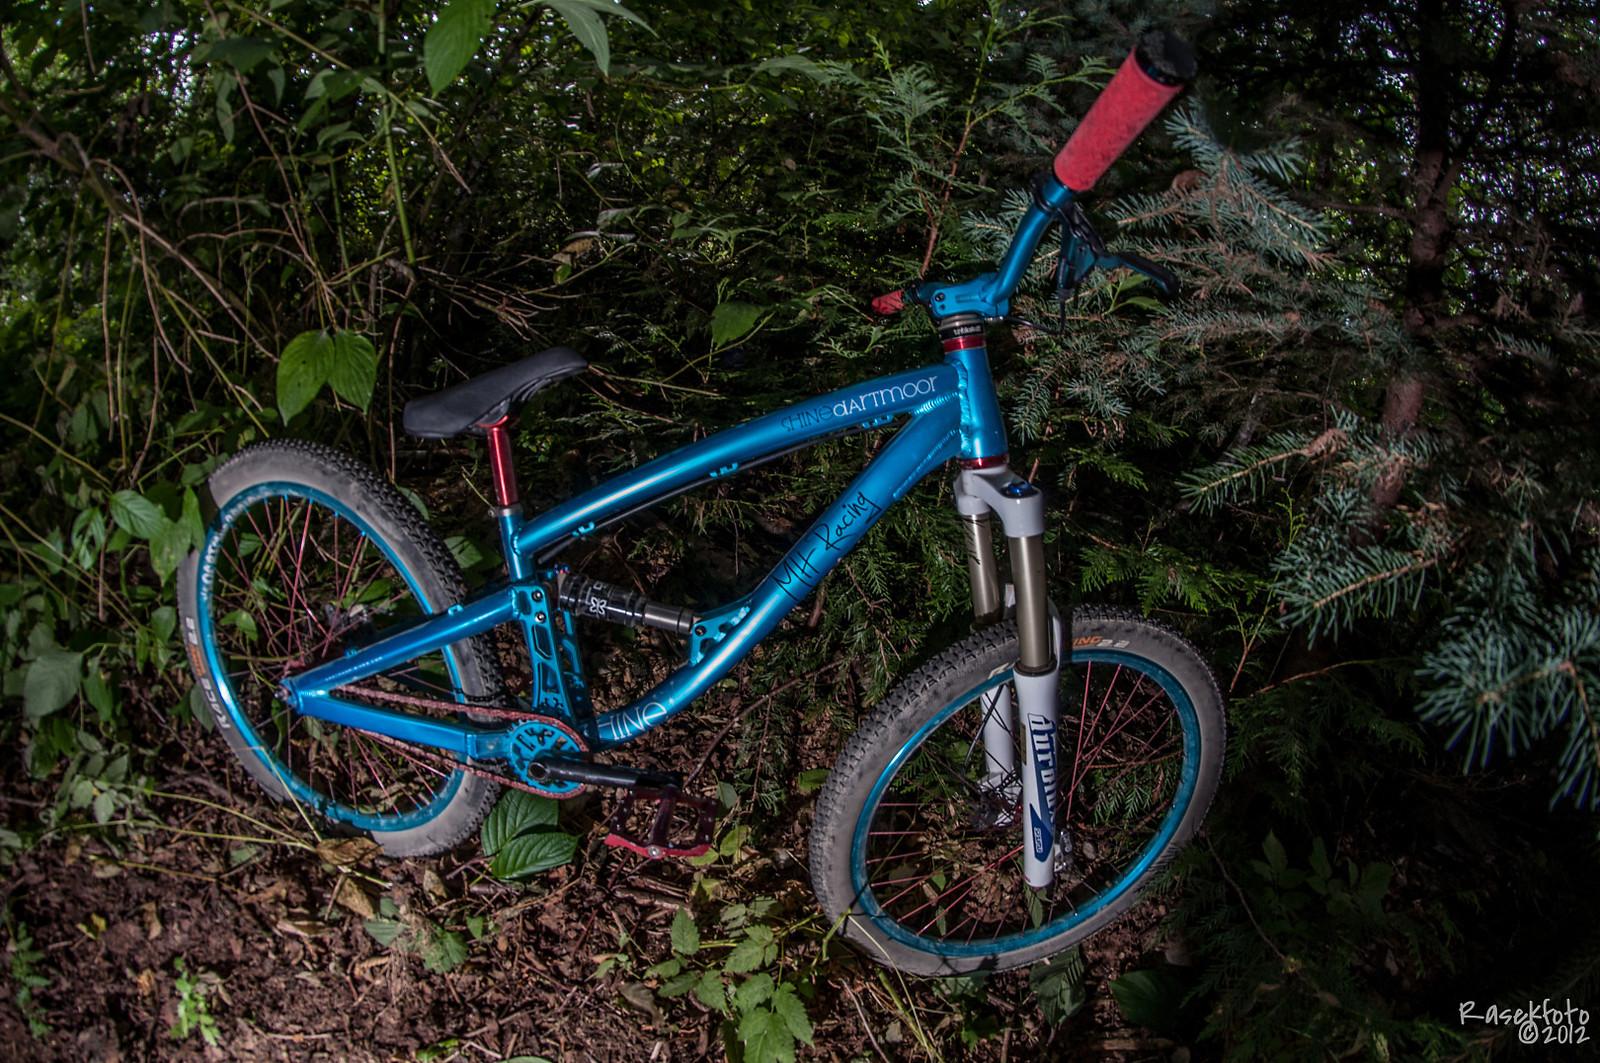 bikecheck - Dartmoor Bikes - Mountain Biking Pictures - Vital MTB